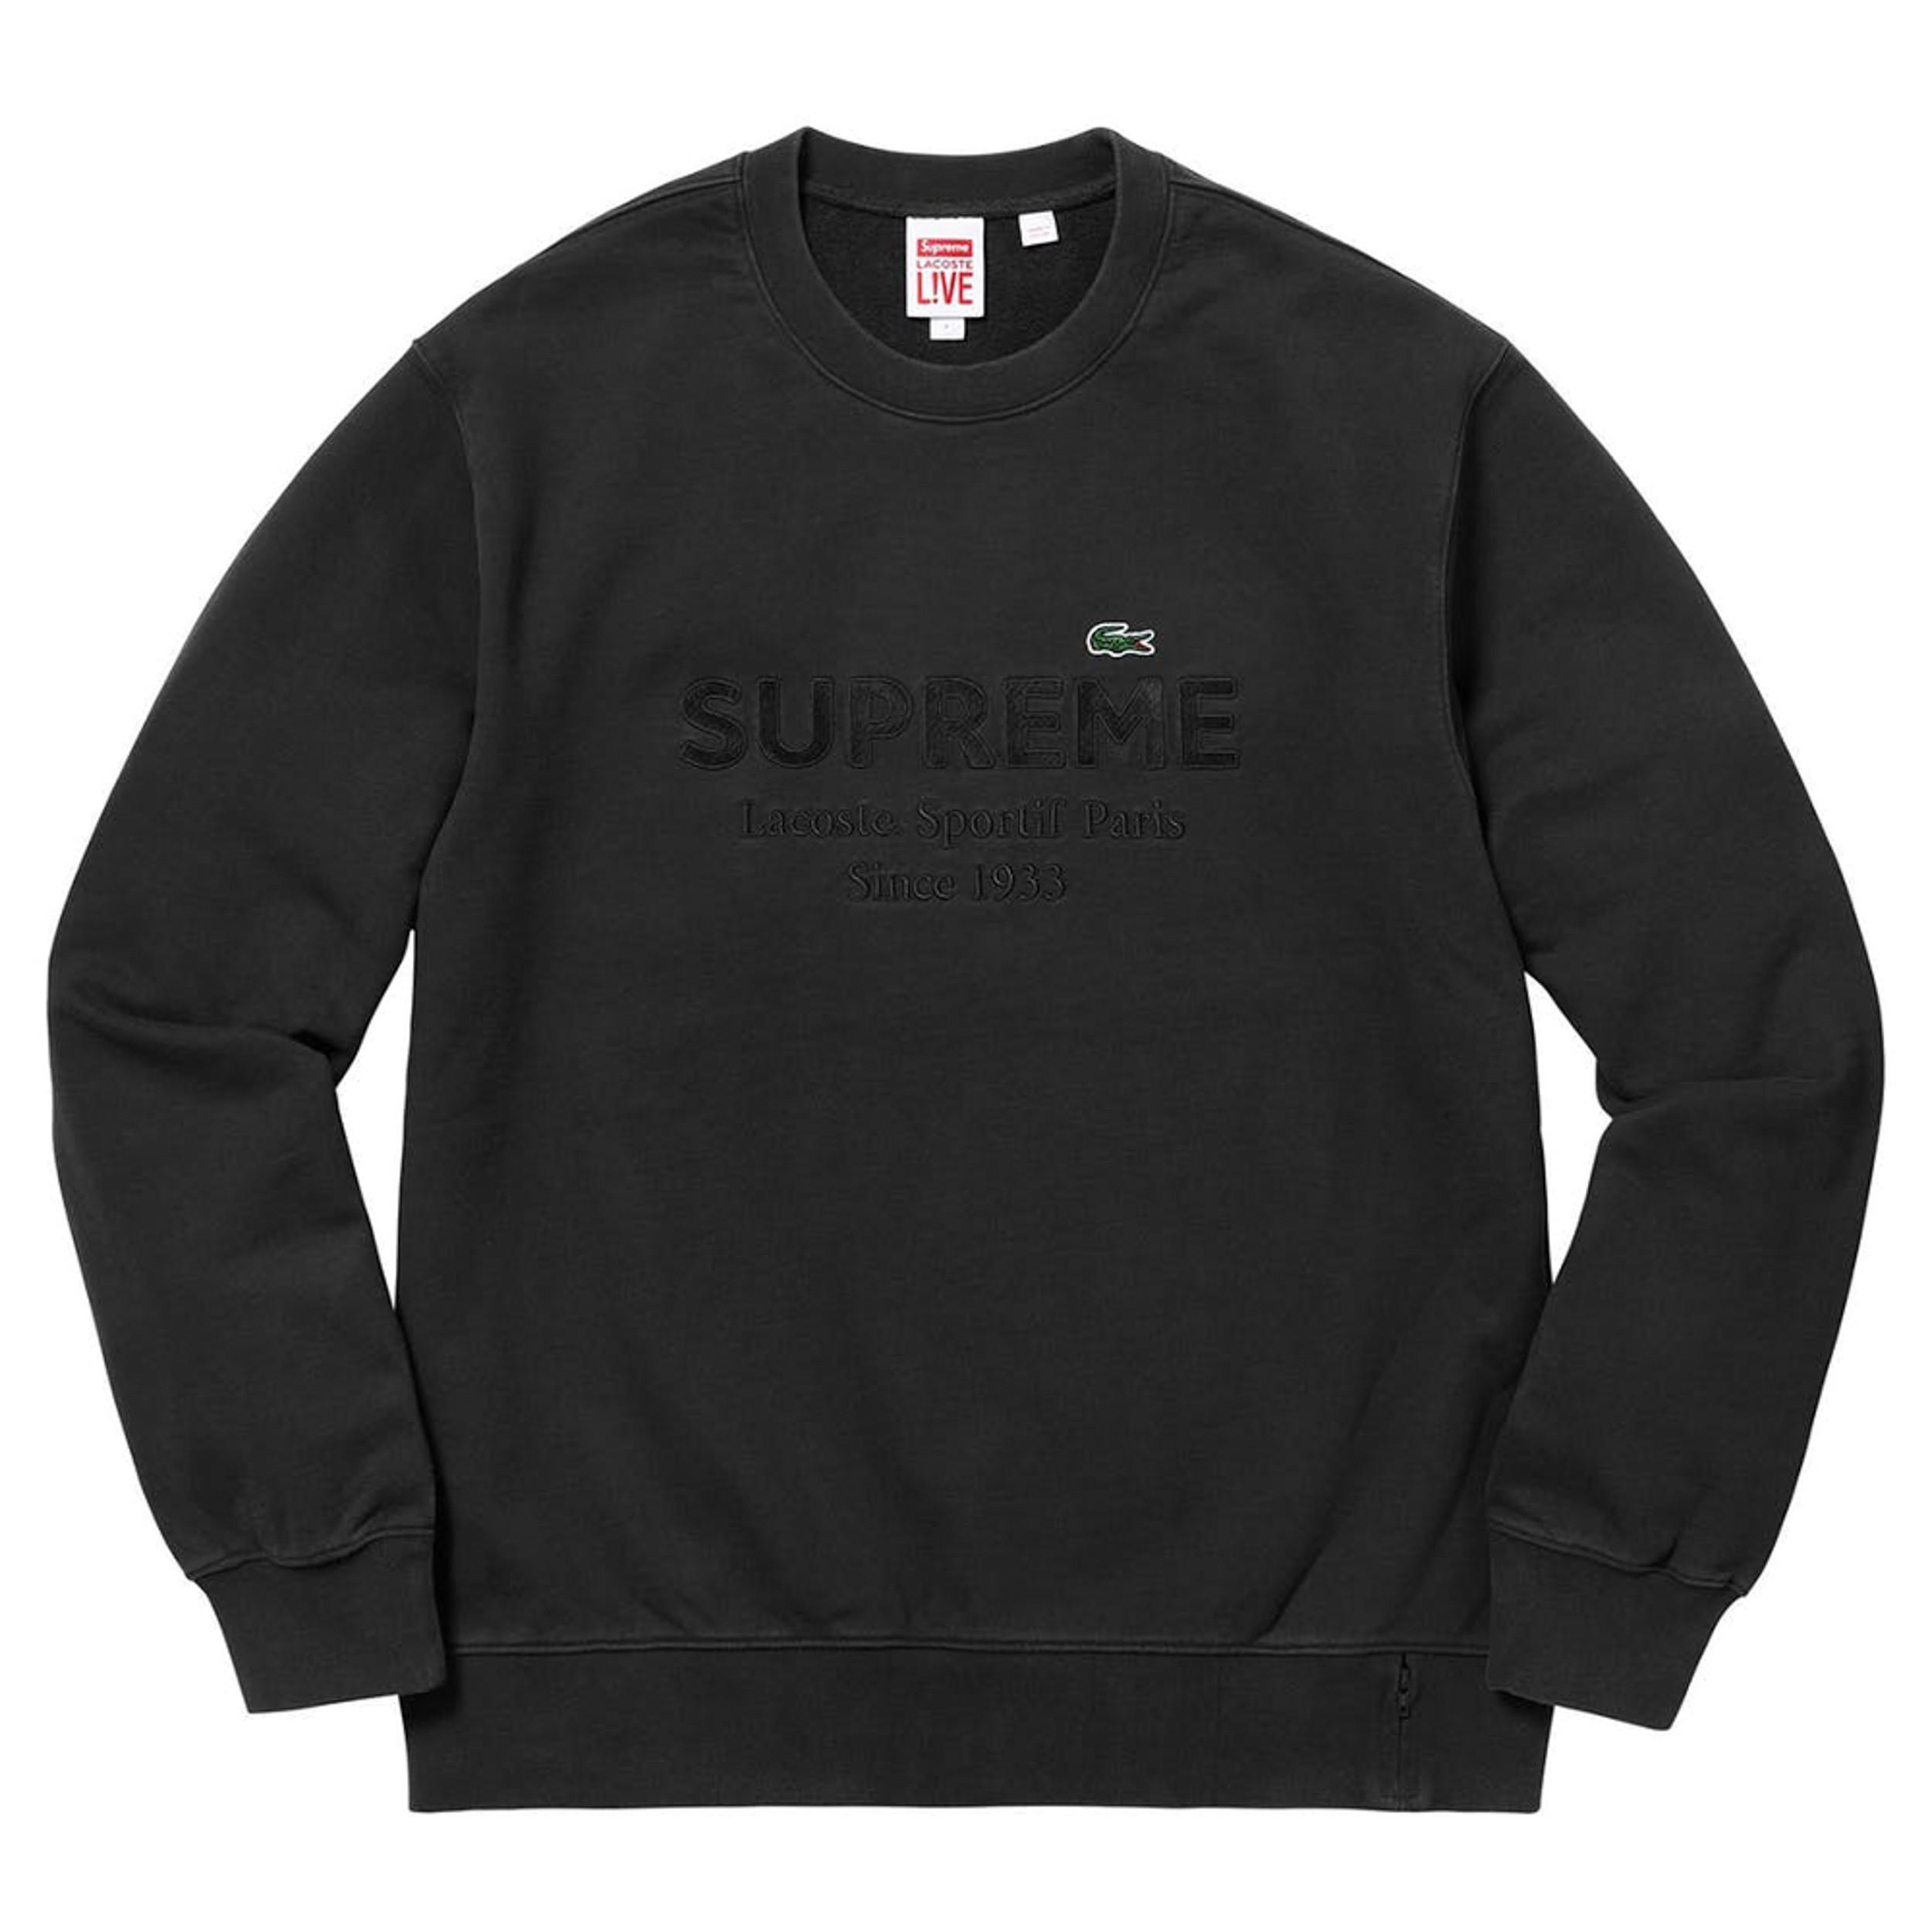 Supreme®/LACOSTE Crewneck Black